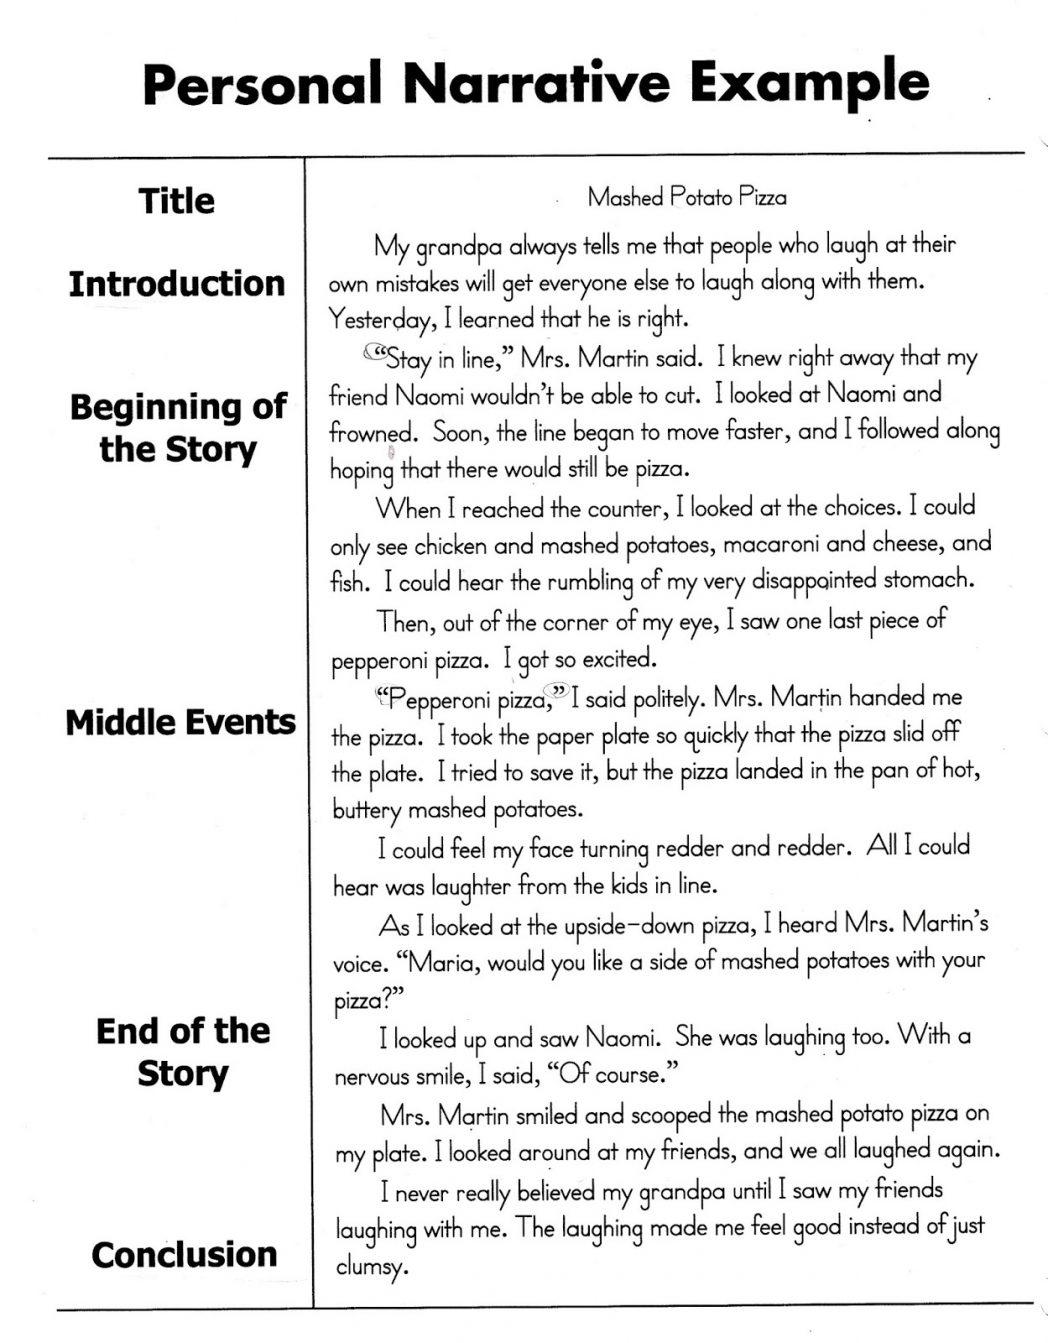 004 Macbeth Essay Topics Example Topic Sample Narrative High School For College Students Personal Prompts Surprising Examples Pdf Grade 11 Tragic Hero Full